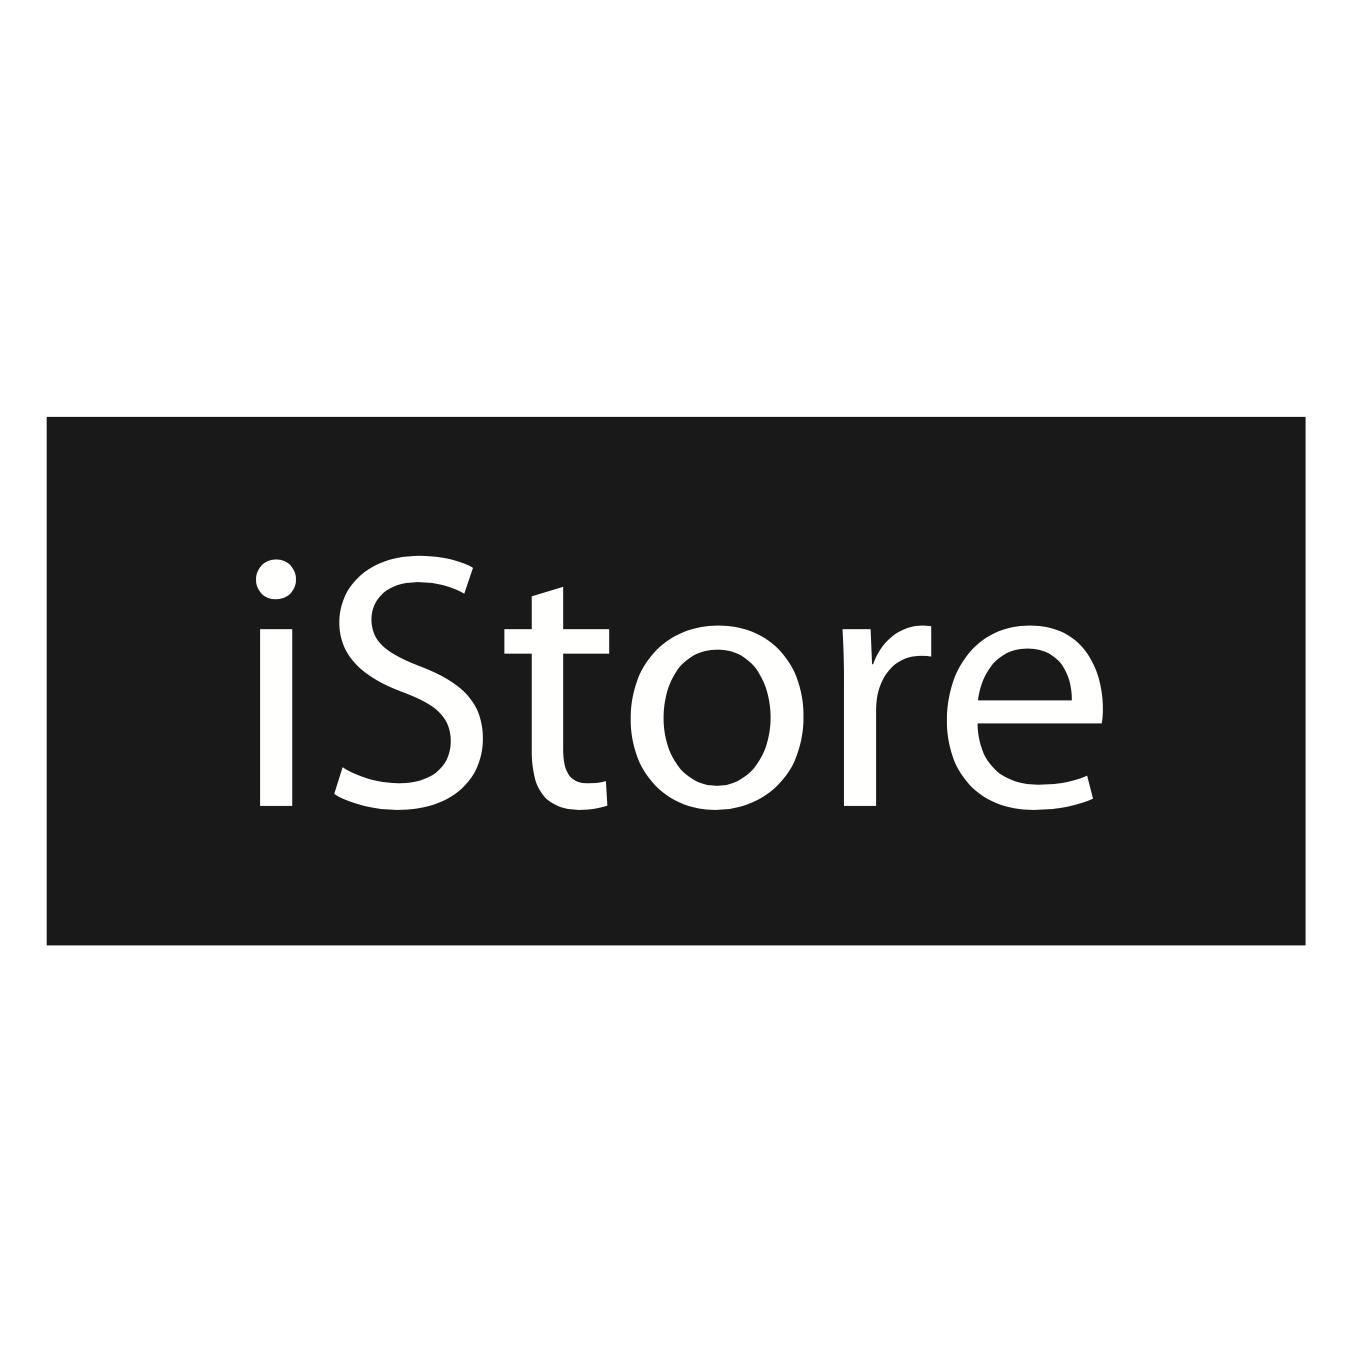 iPhone X Silicone Case - Peach